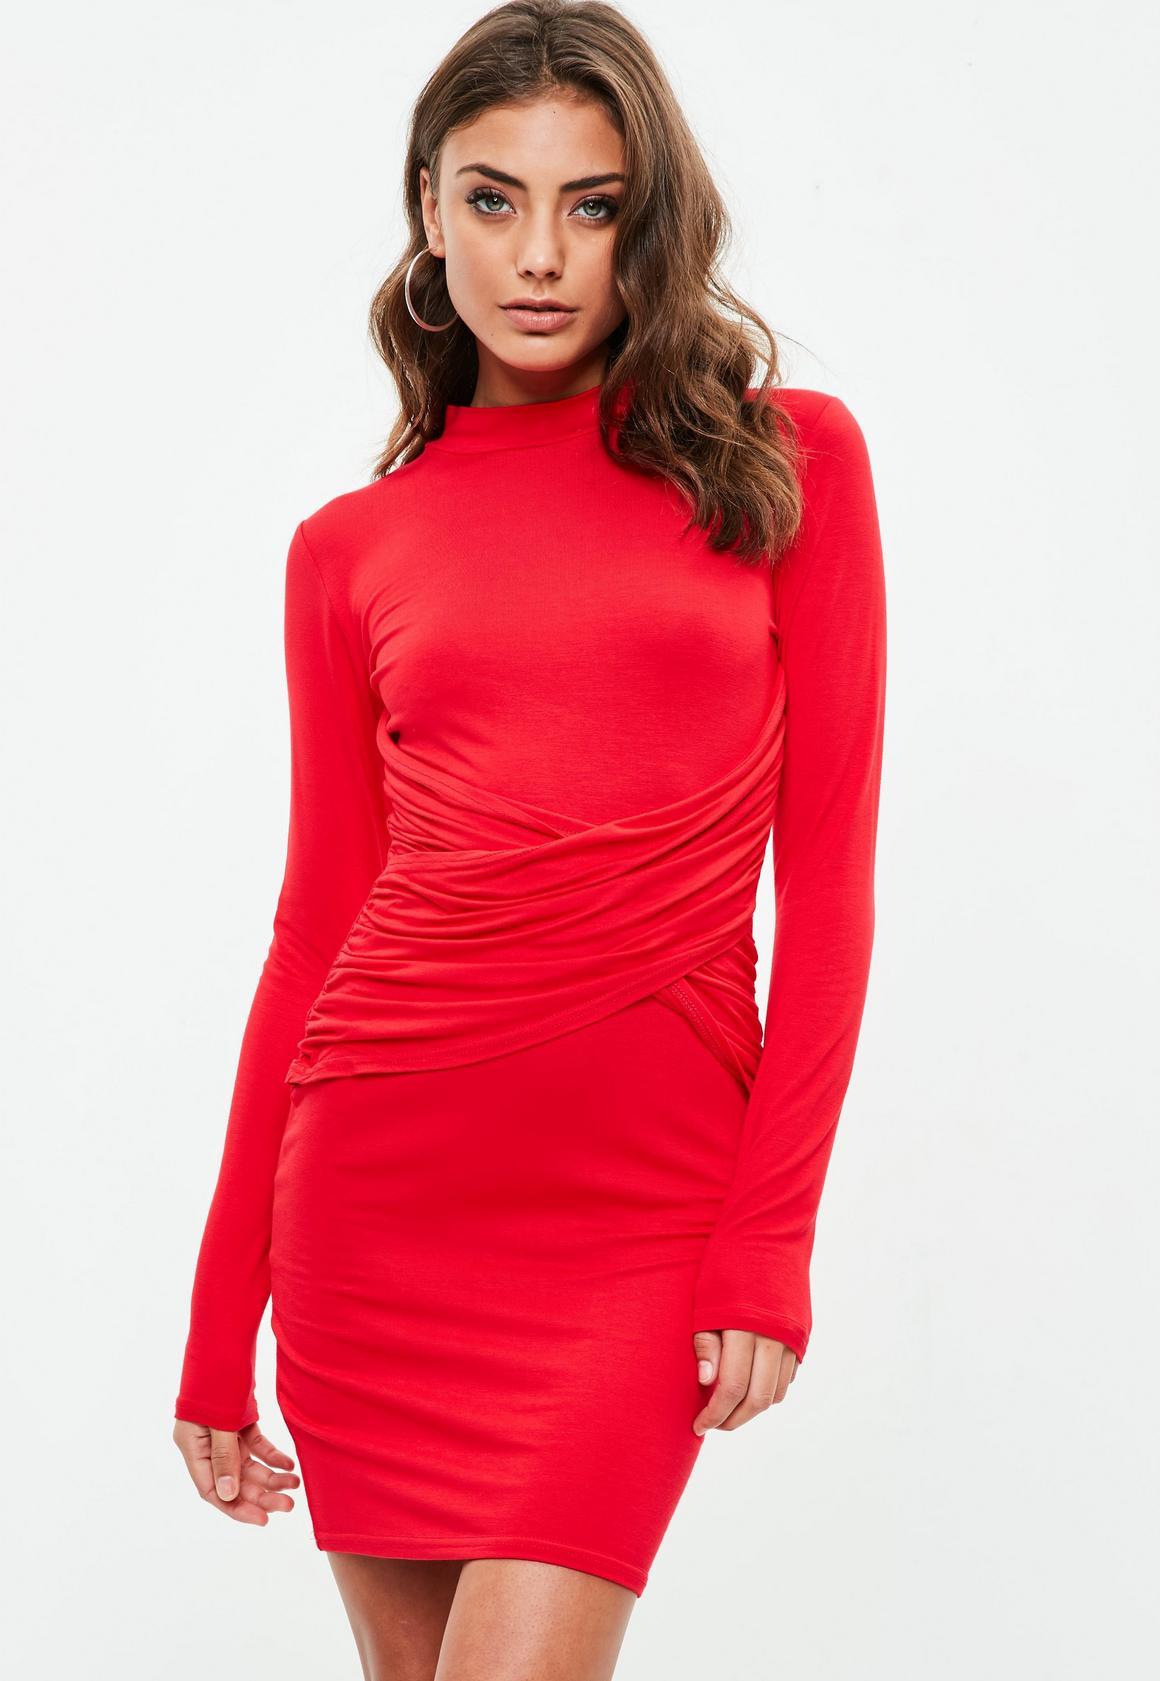 Red Long Sleeve High Neck Cross Mini Dress | Missguided Australia